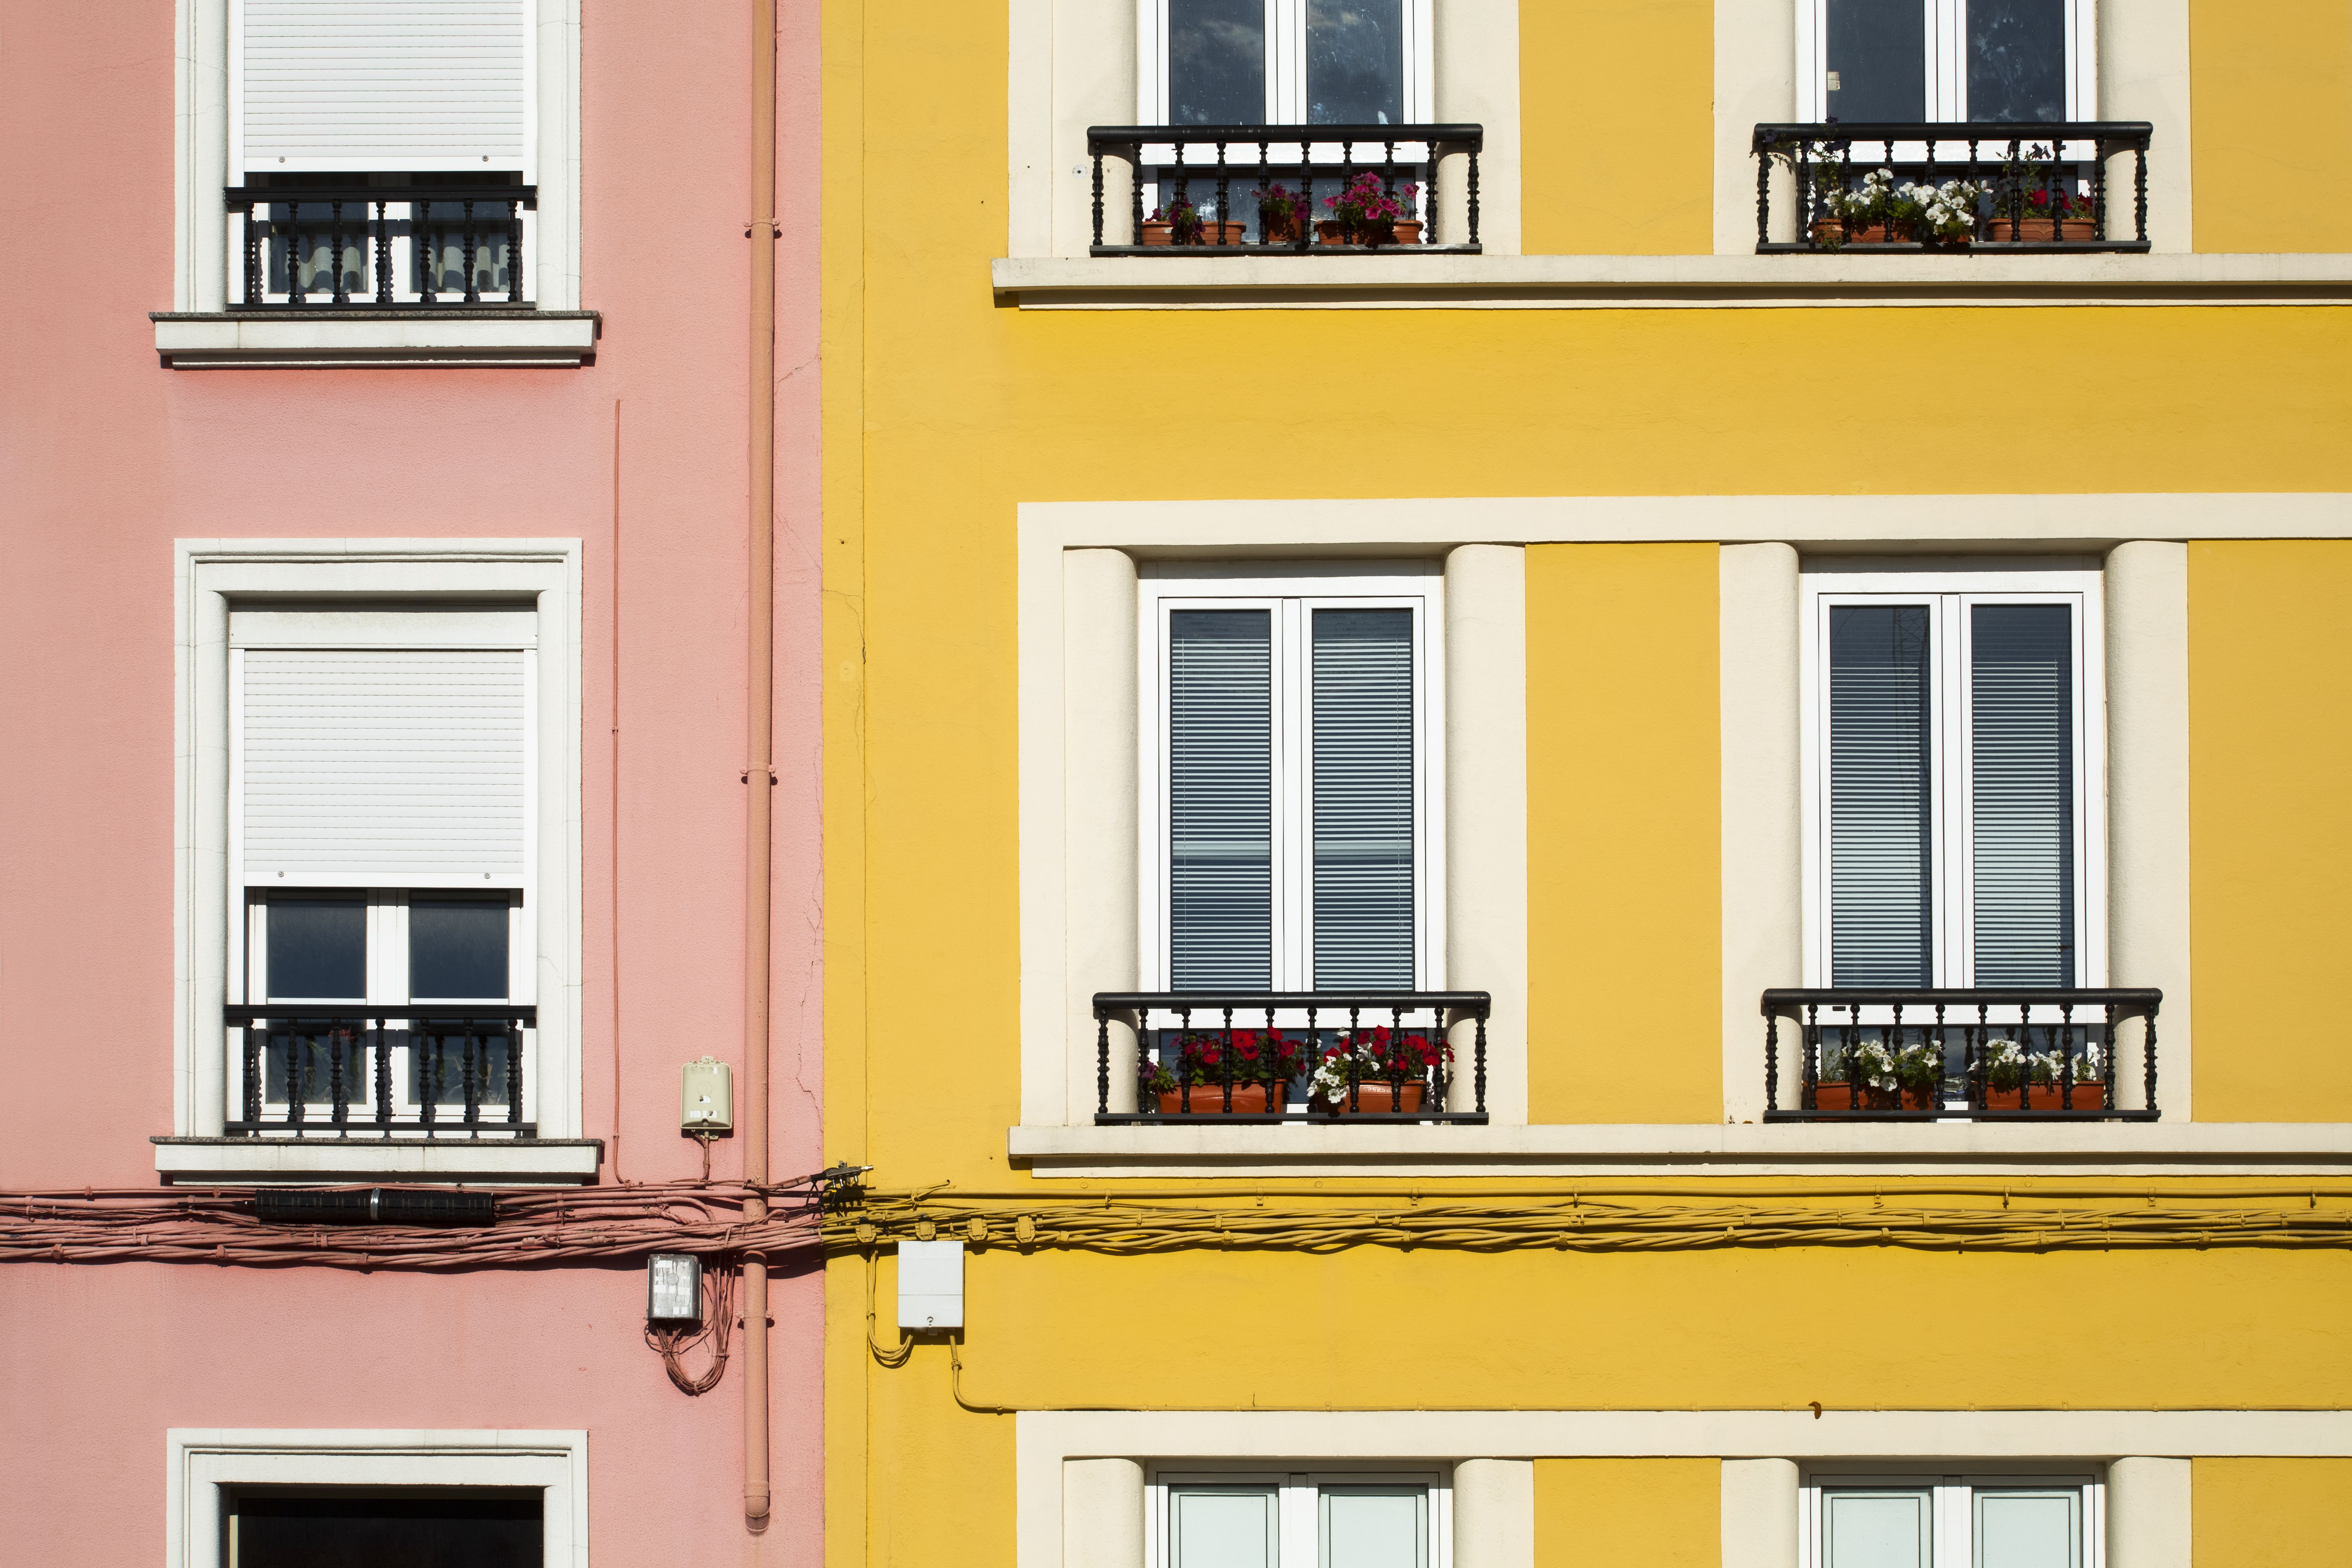 Impermeabilizaciones de fachadas: Servicios de Aconteser